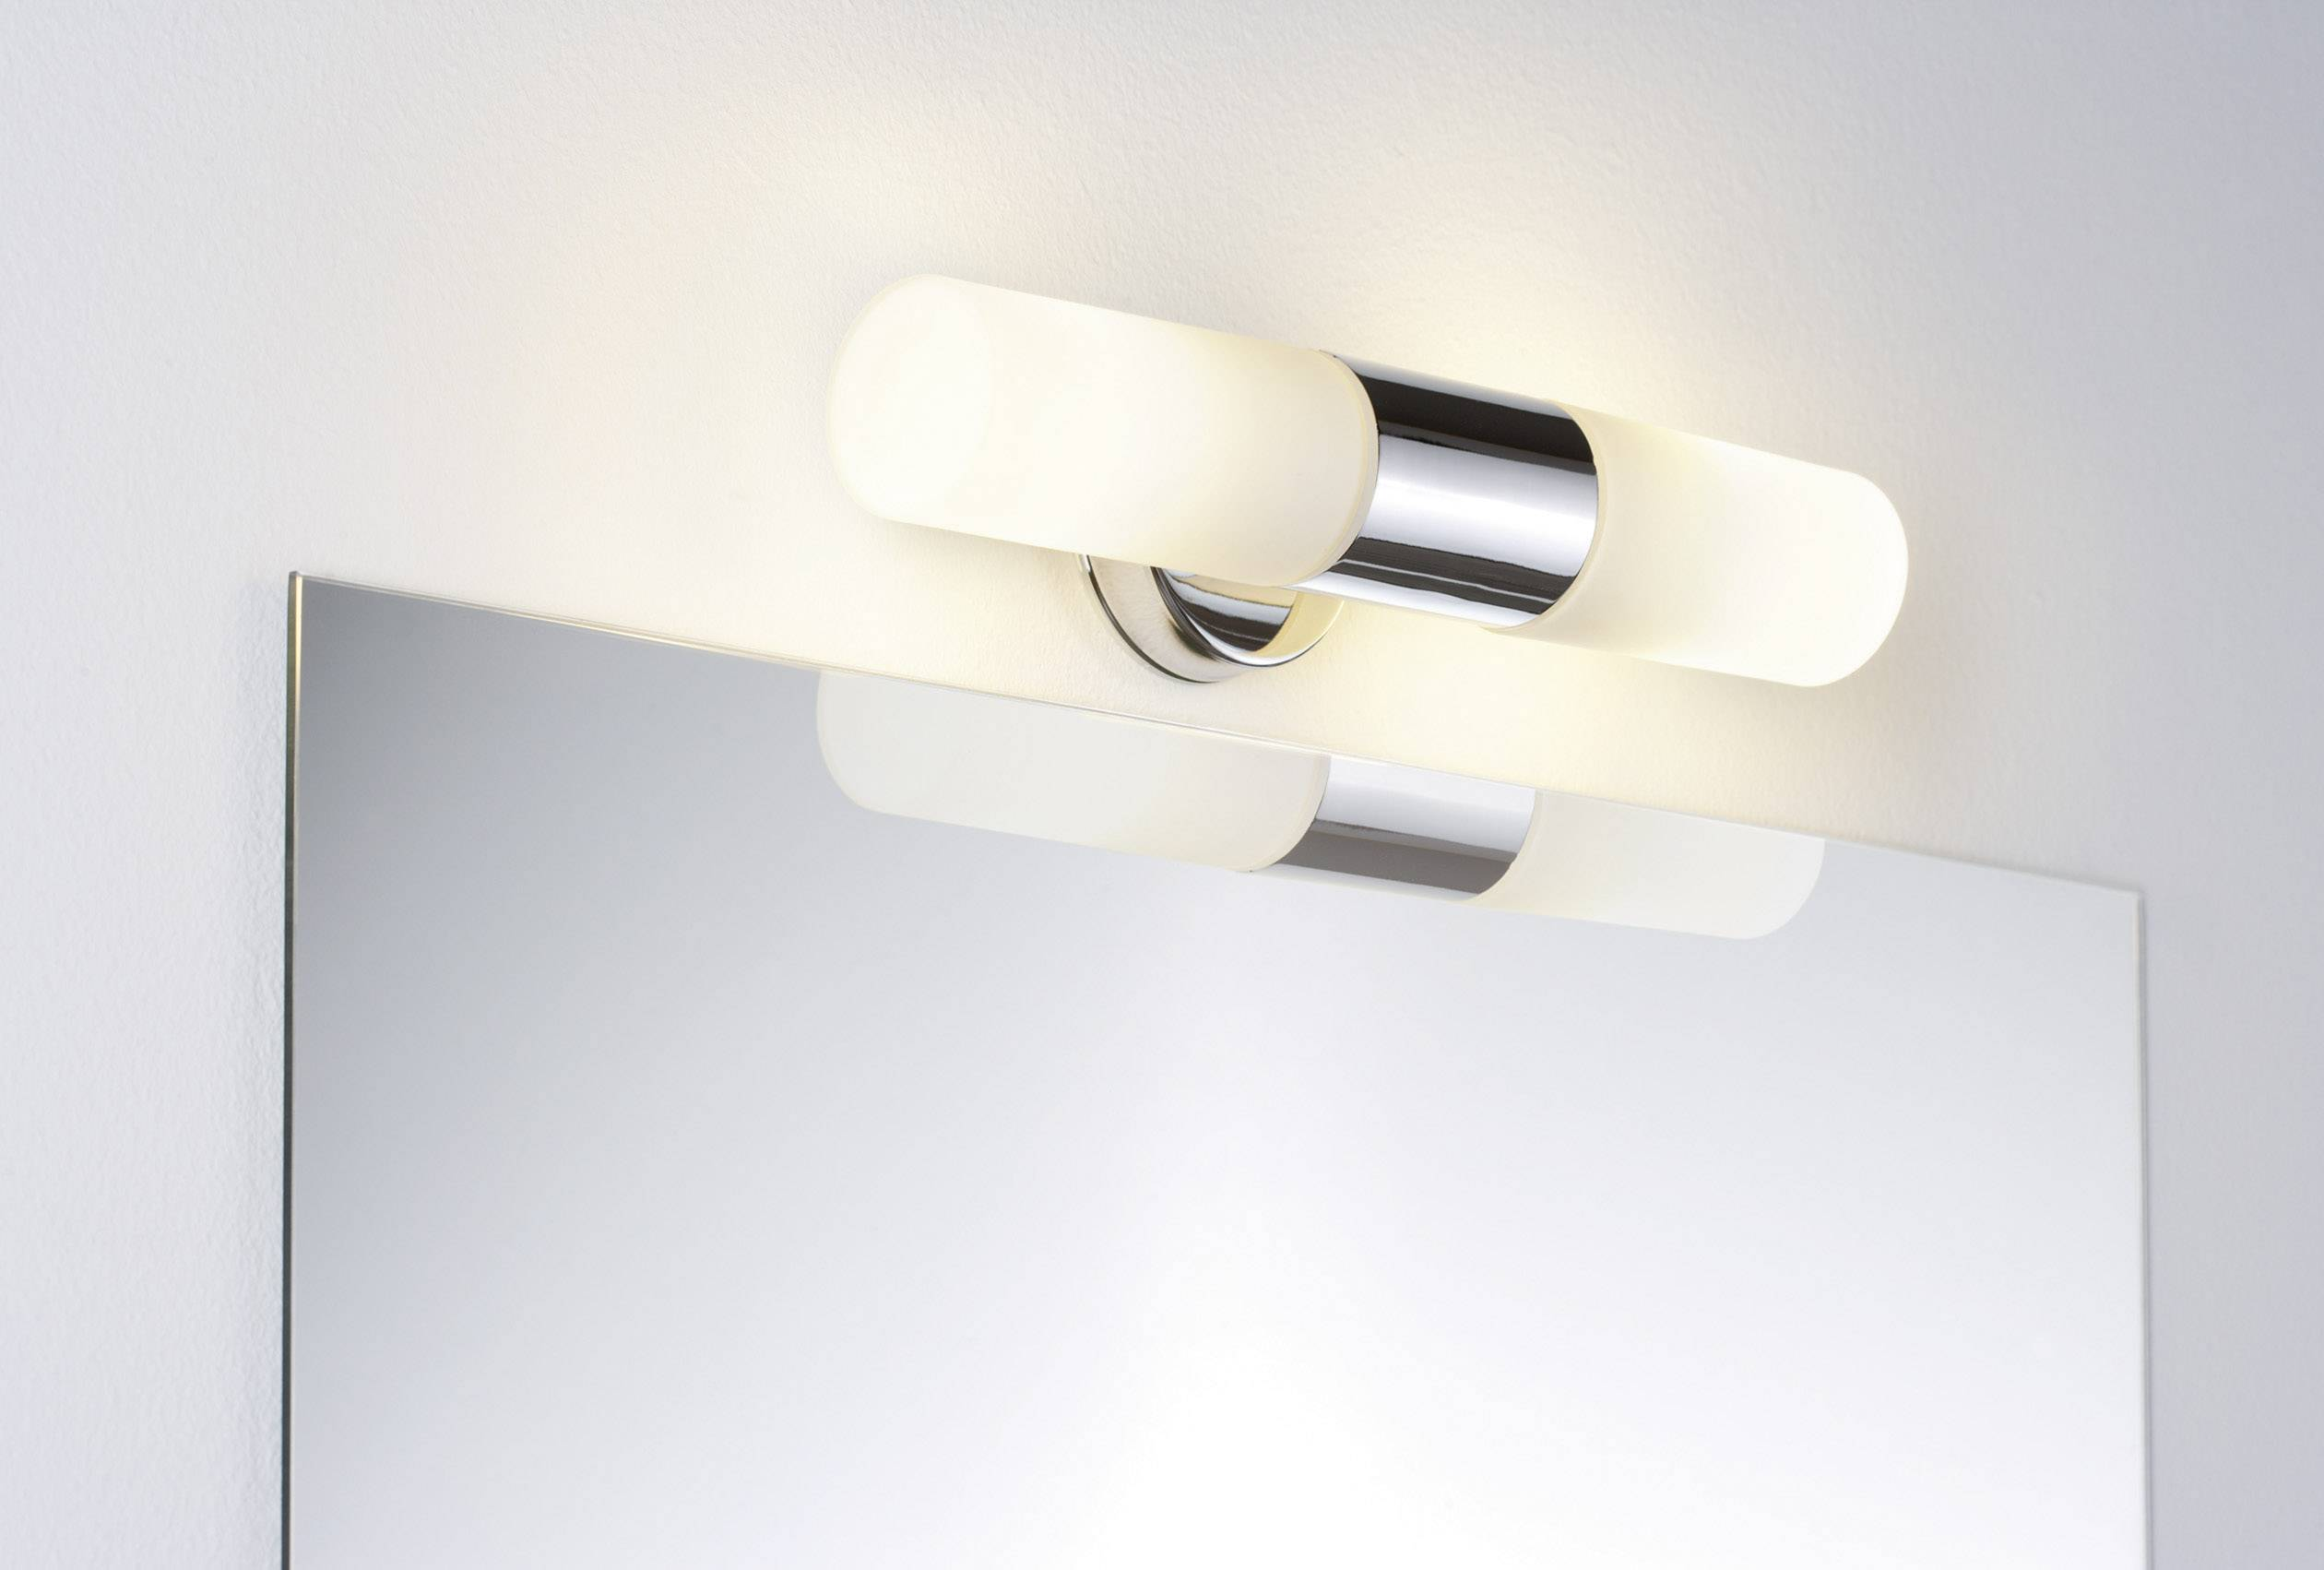 Spiegellamp Voor Badkamer : Badkamer wandlamp led halogeen e14 40 w paulmann lenia 70350 chroom